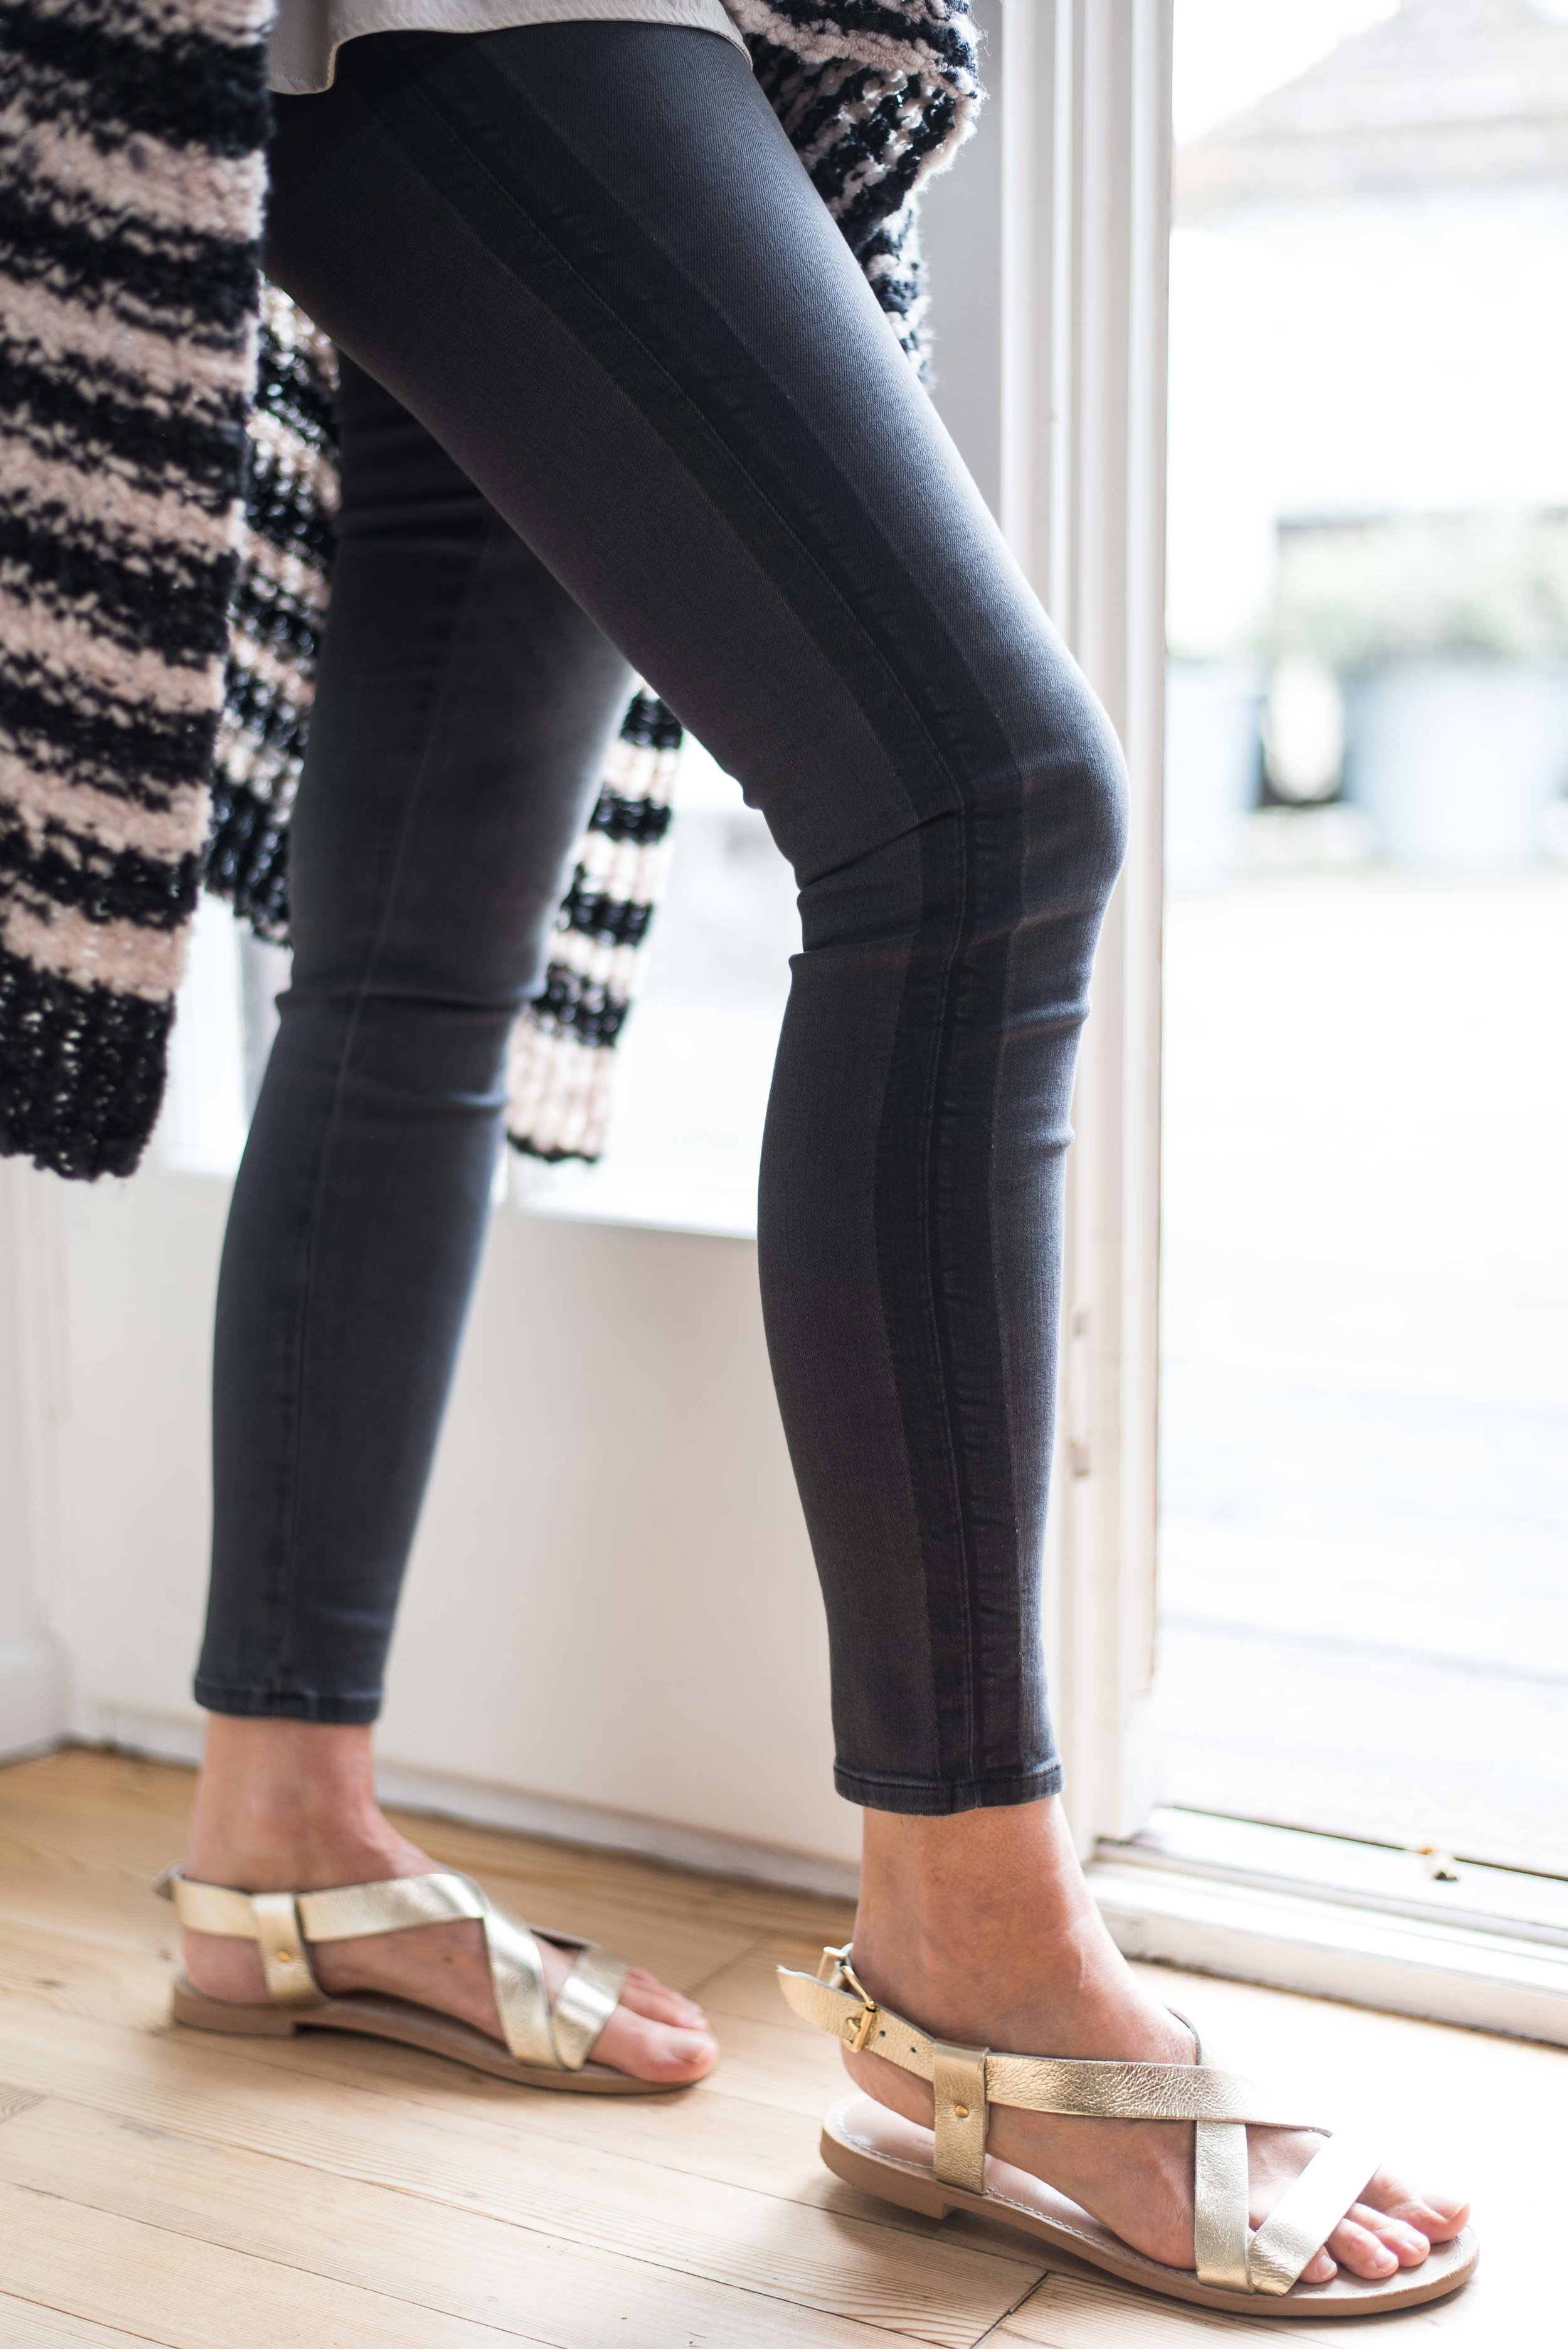 befifty Blog für Frauen über 50 Fashion DAWN Hose Outfit Stylingtipps Skinny Jeans Figurschmeichler. Tipps für Frauen über 40 und Über 50 Figurtipps Jeans